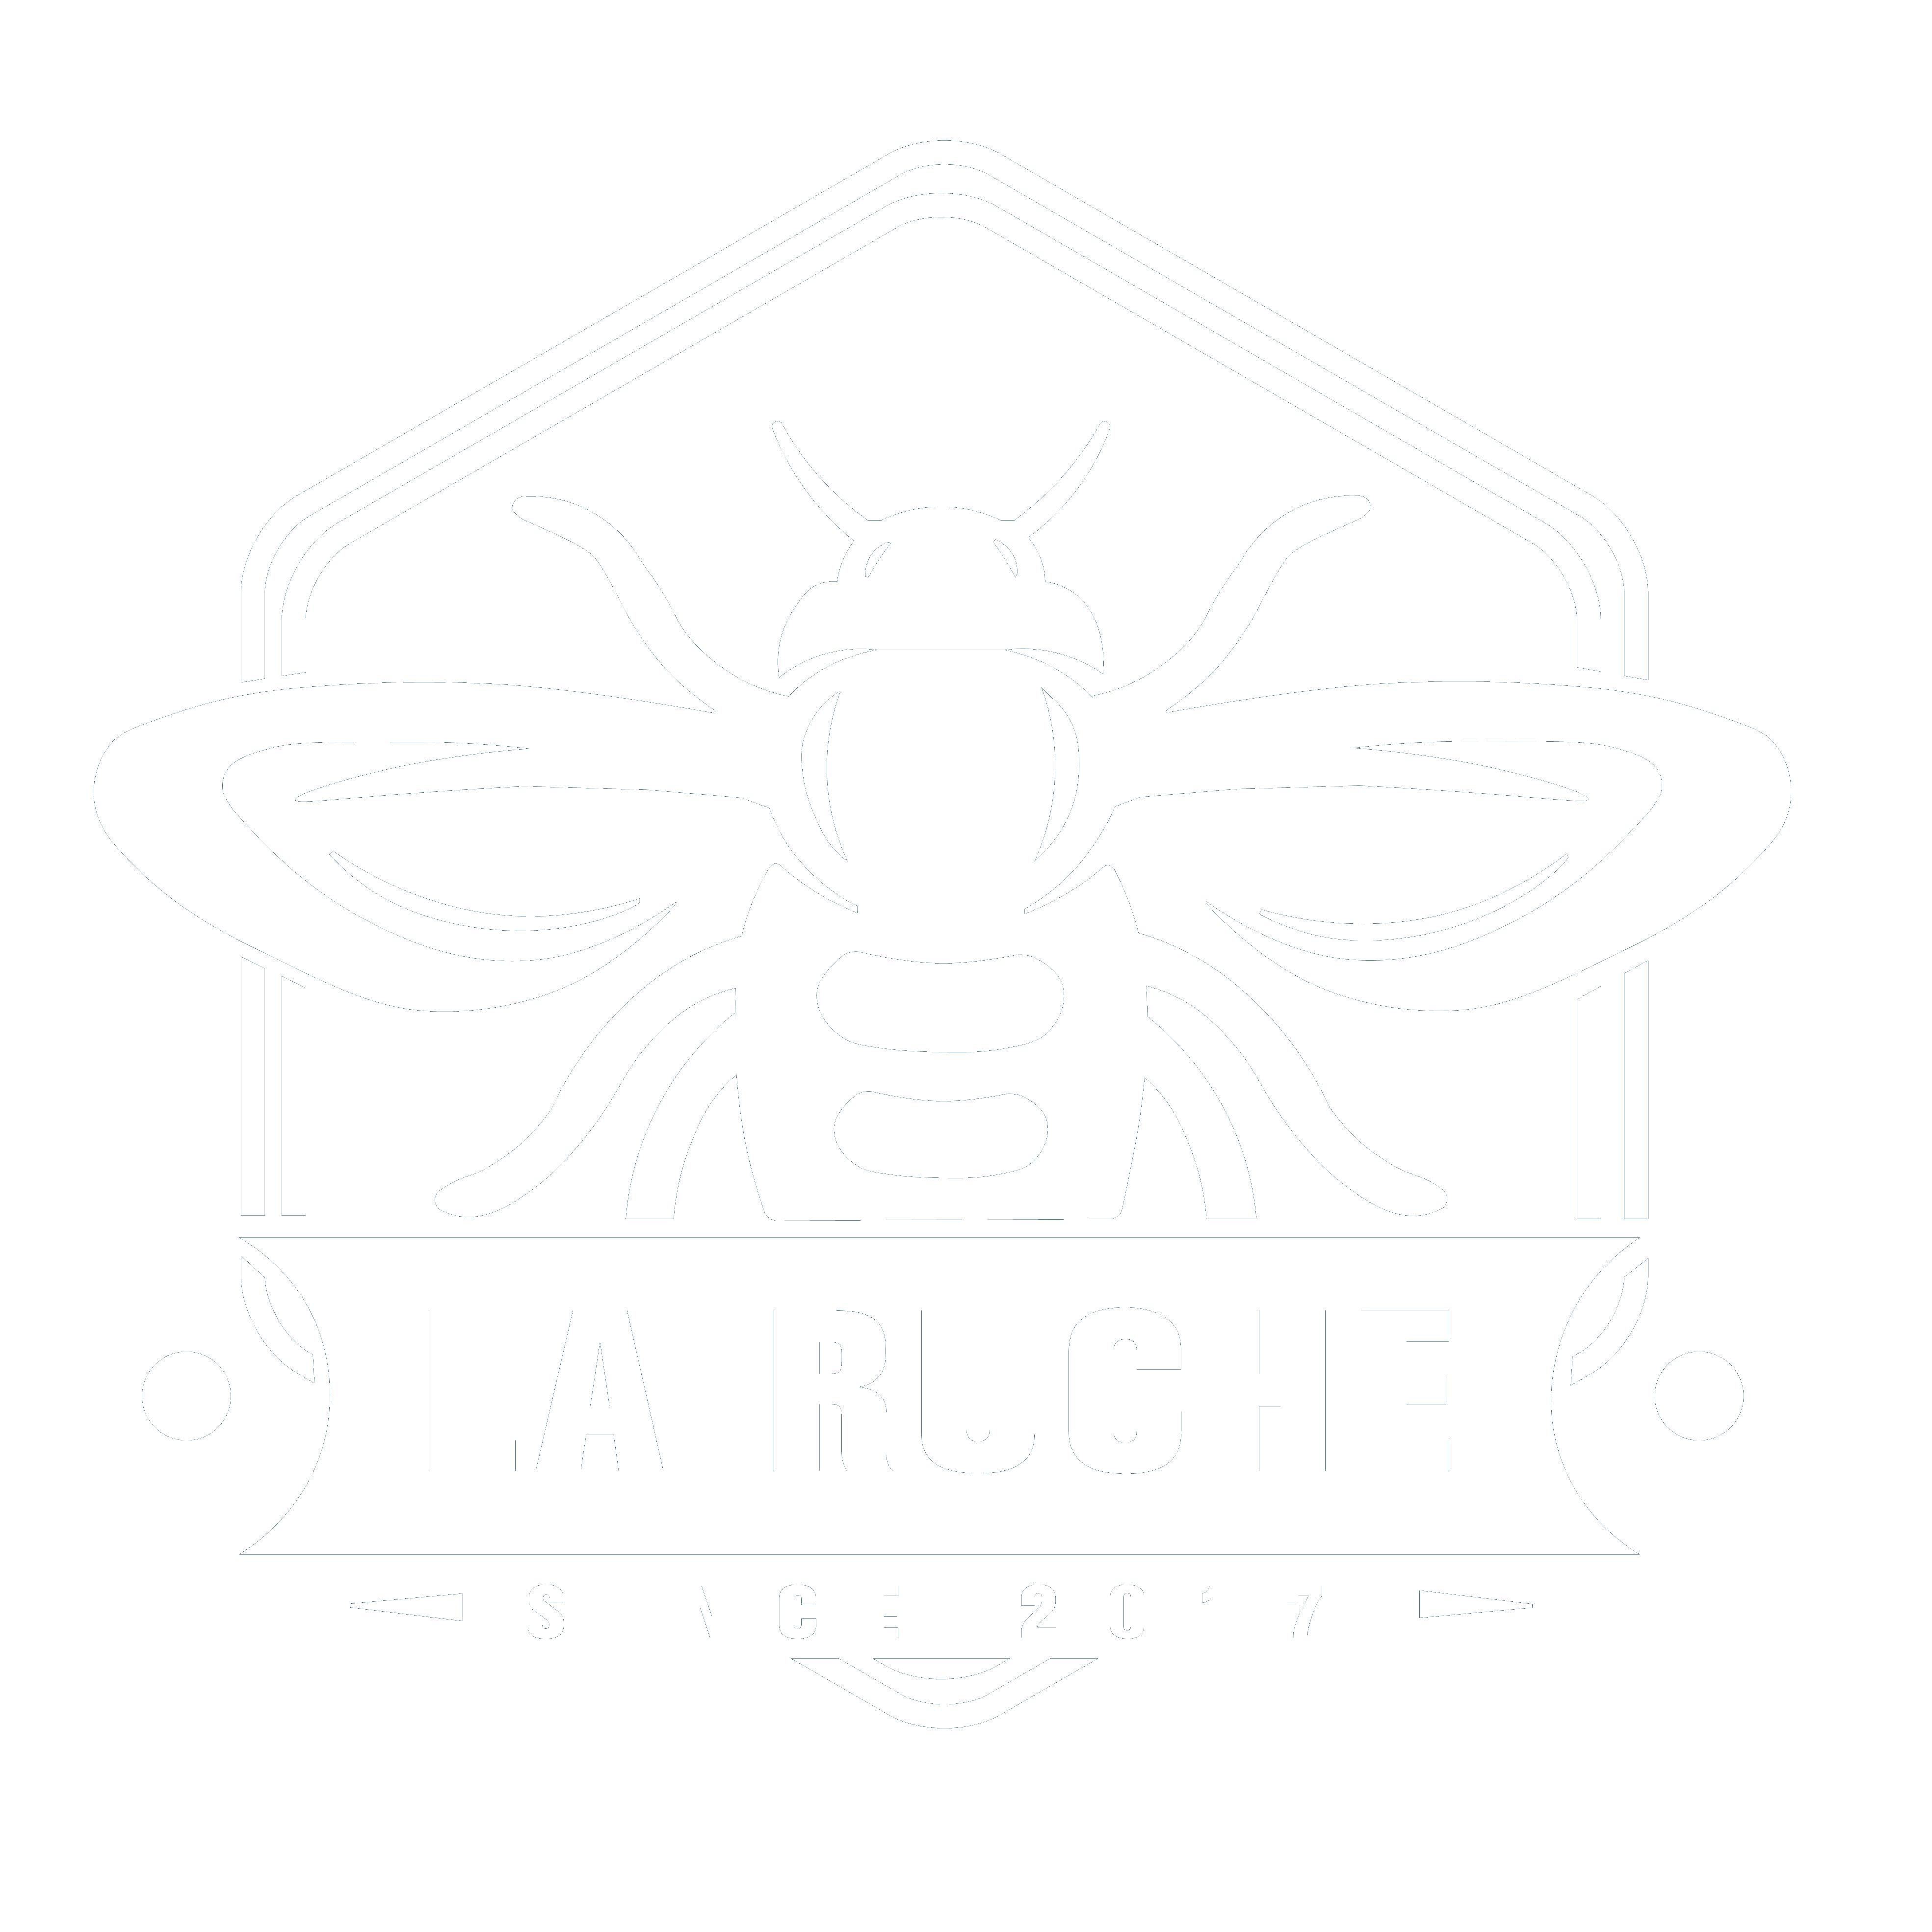 https://politeia-ices.fr/wp-content/uploads/2020/11/La_Rurche_Logo_Blanc.png